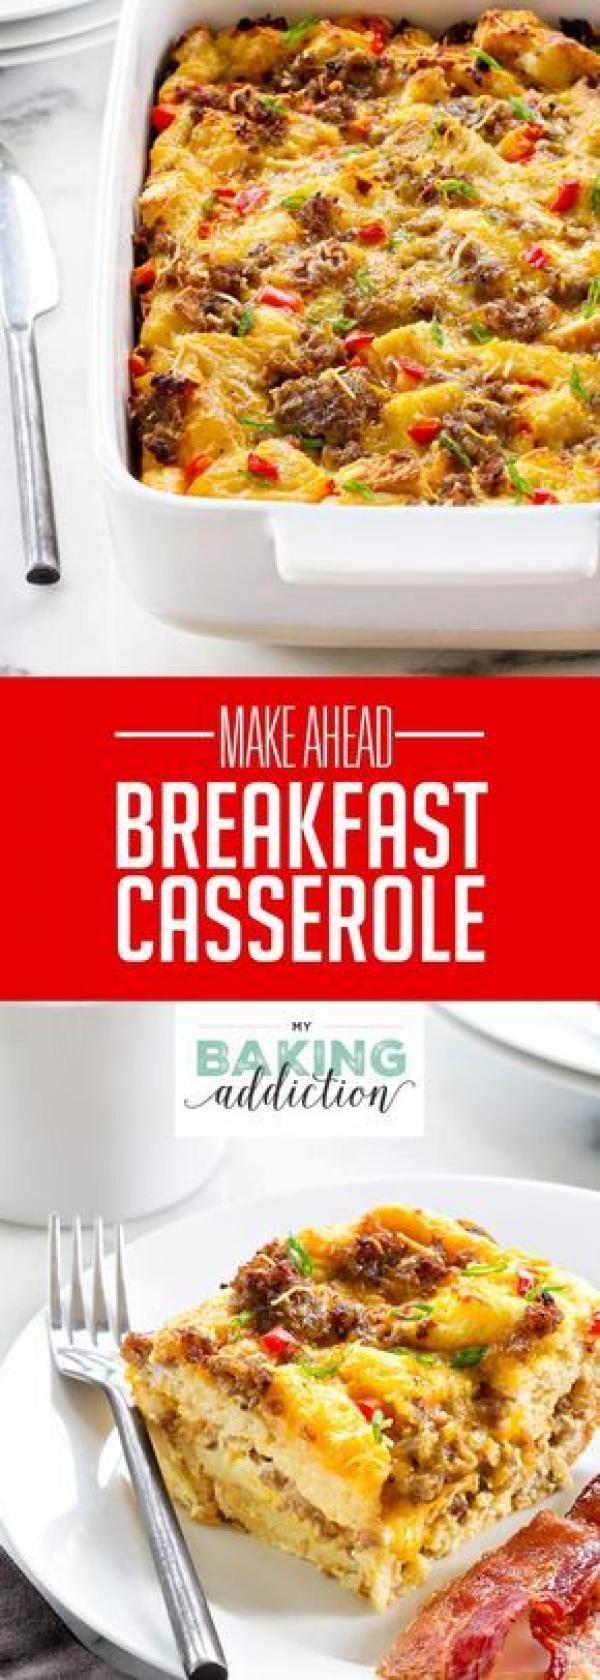 Make Ahead Breakfast Casserole - My Baking Addiction #breakfastcasserolemakeahead